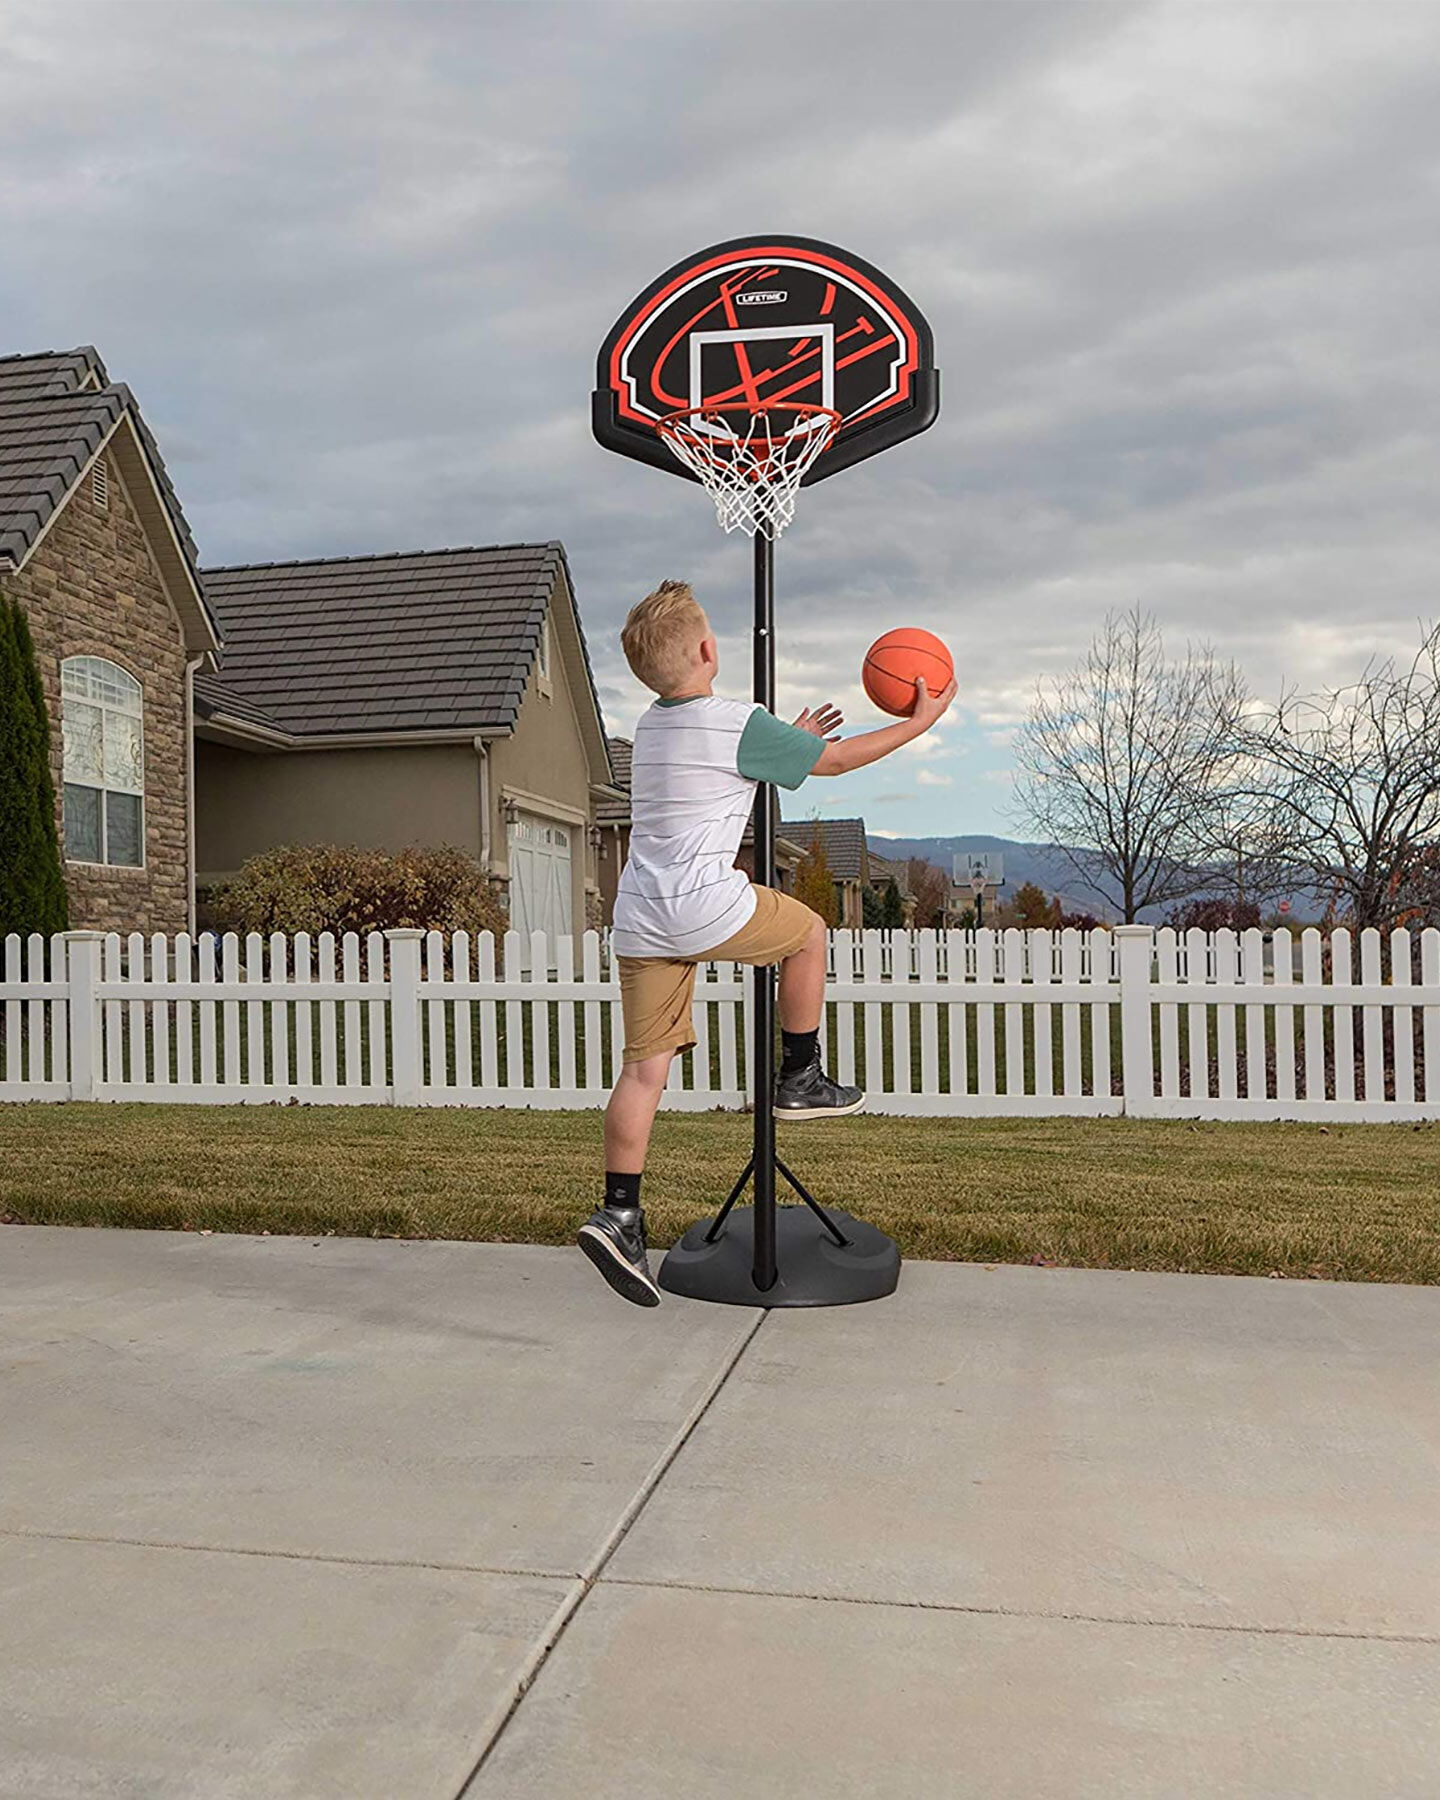 Attrezzatura basket LIFETIME IMPIANTO BASKET JR S2000549|896|- scatto 3